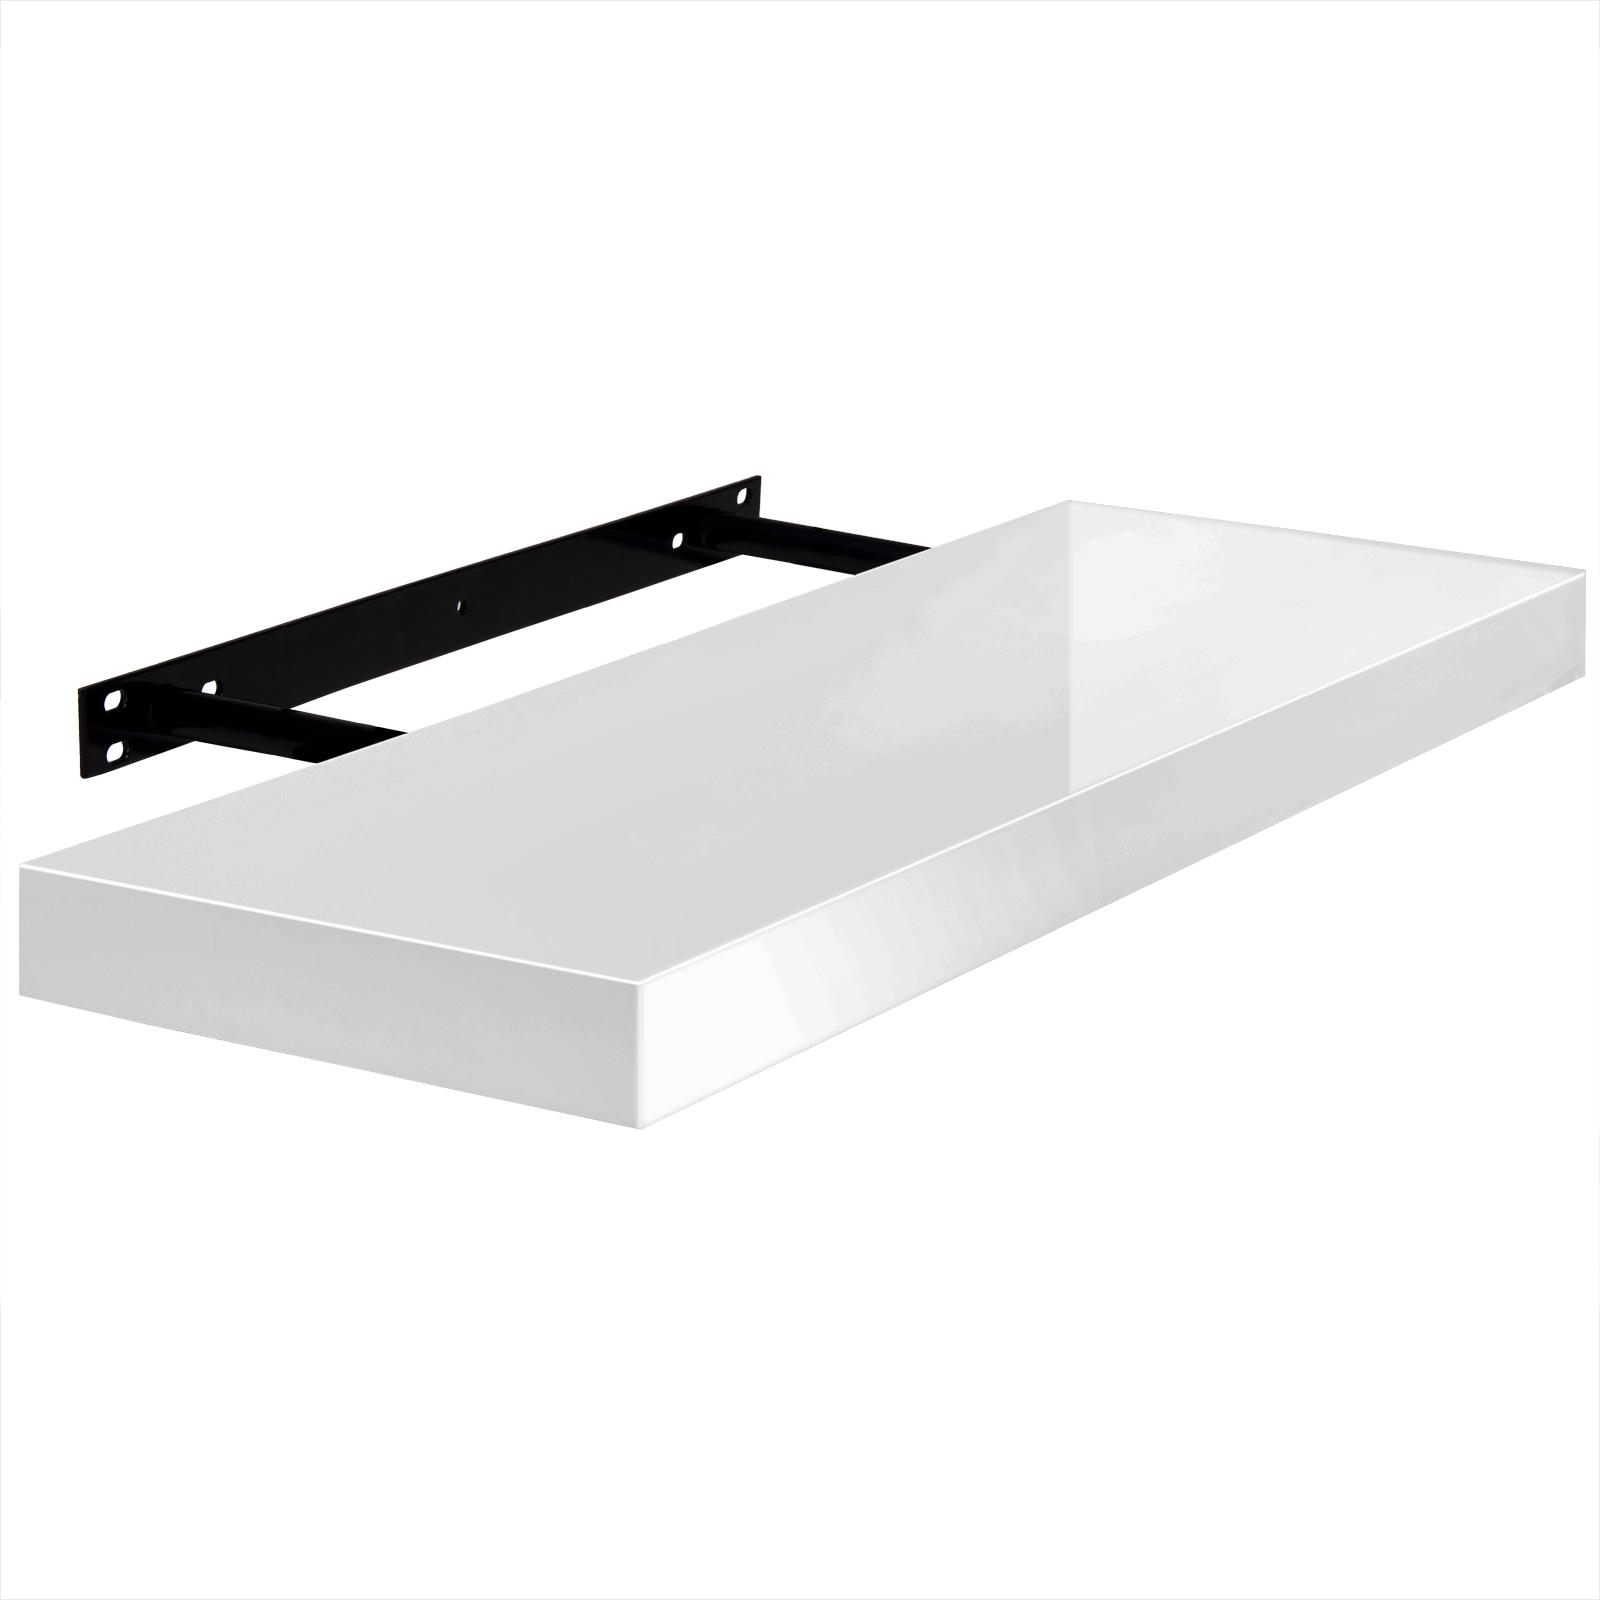 tag re murale fixation rapide r siste jusqu 39 15kg. Black Bedroom Furniture Sets. Home Design Ideas